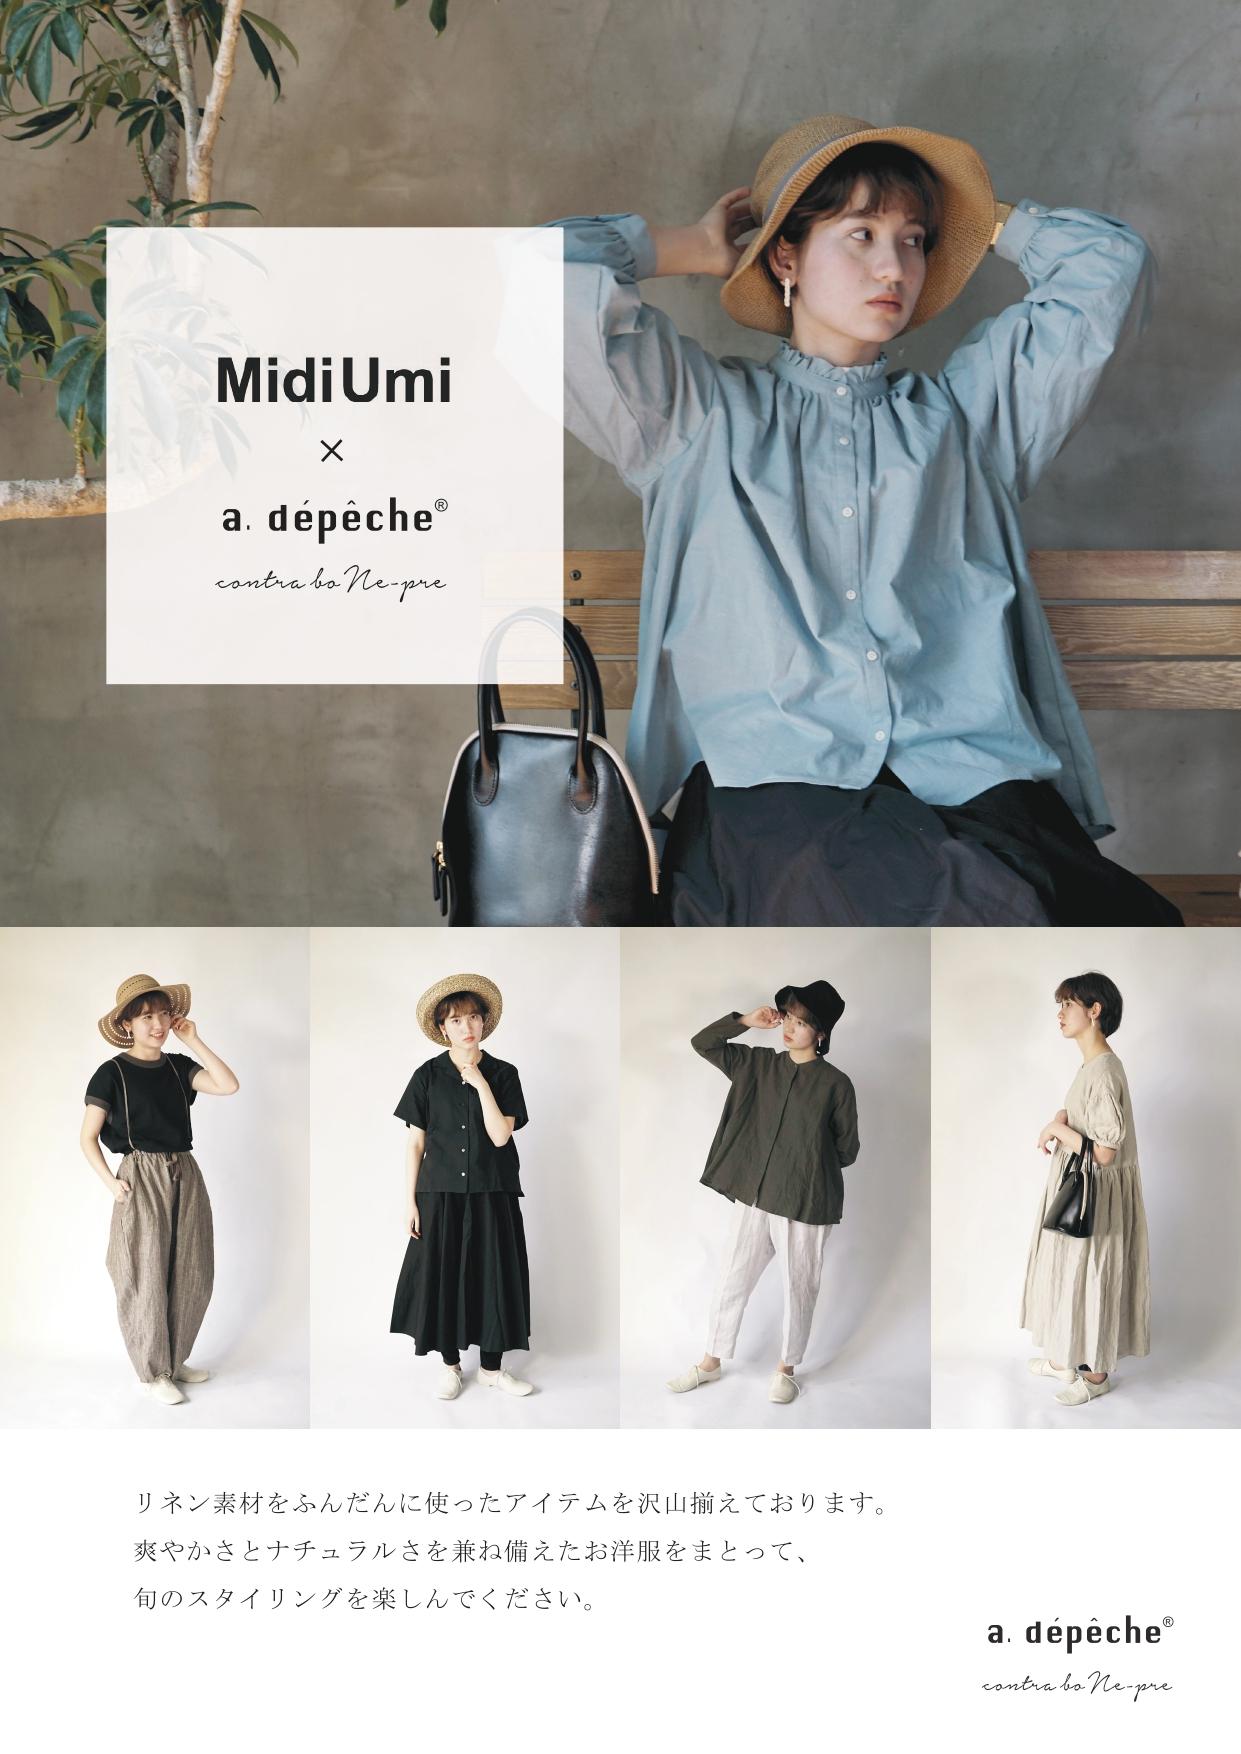 【a.depeche】MidiUmi×a.depeche 春の別注商品リリース!